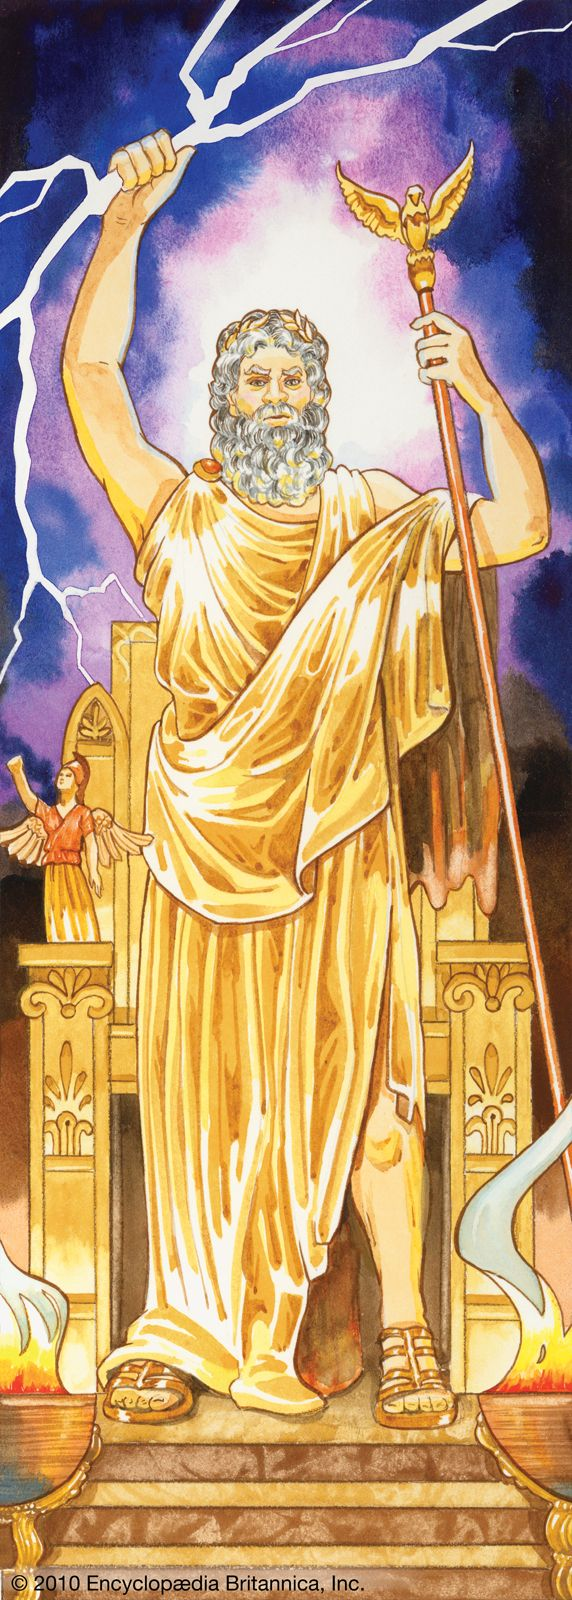 Primary homework help greek gods